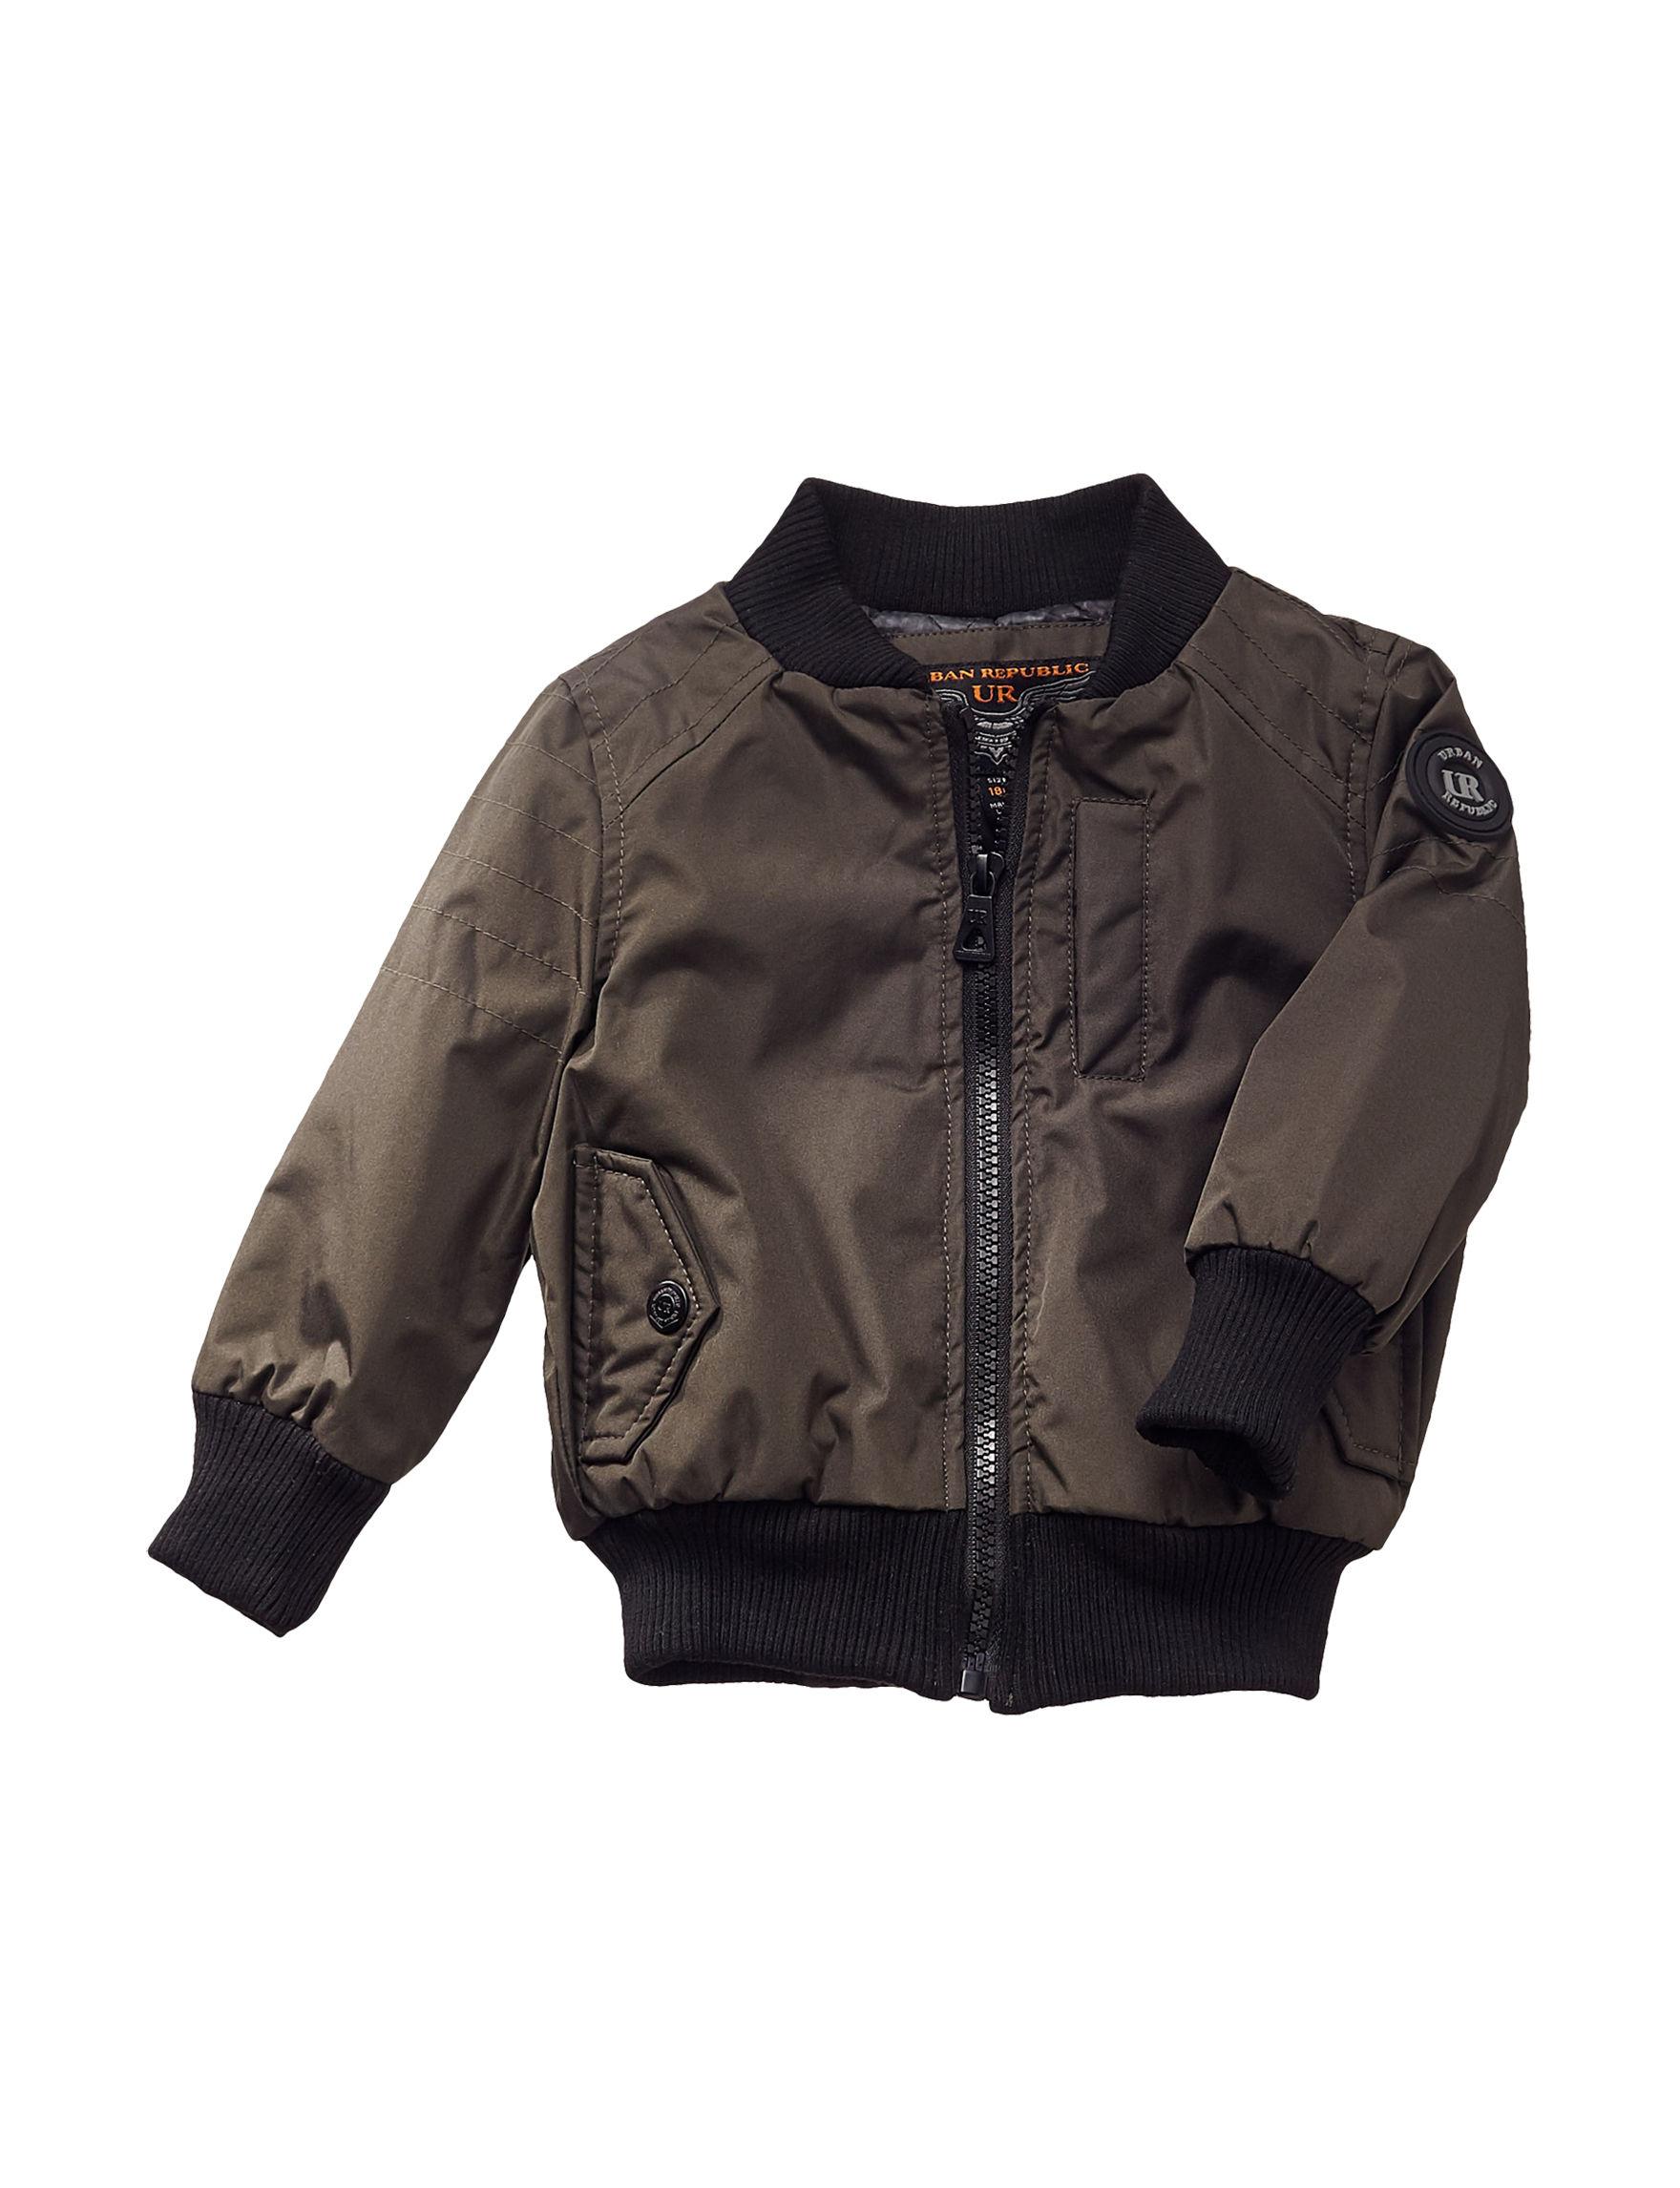 Urban Republic Olive Fleece & Soft Shell Jackets